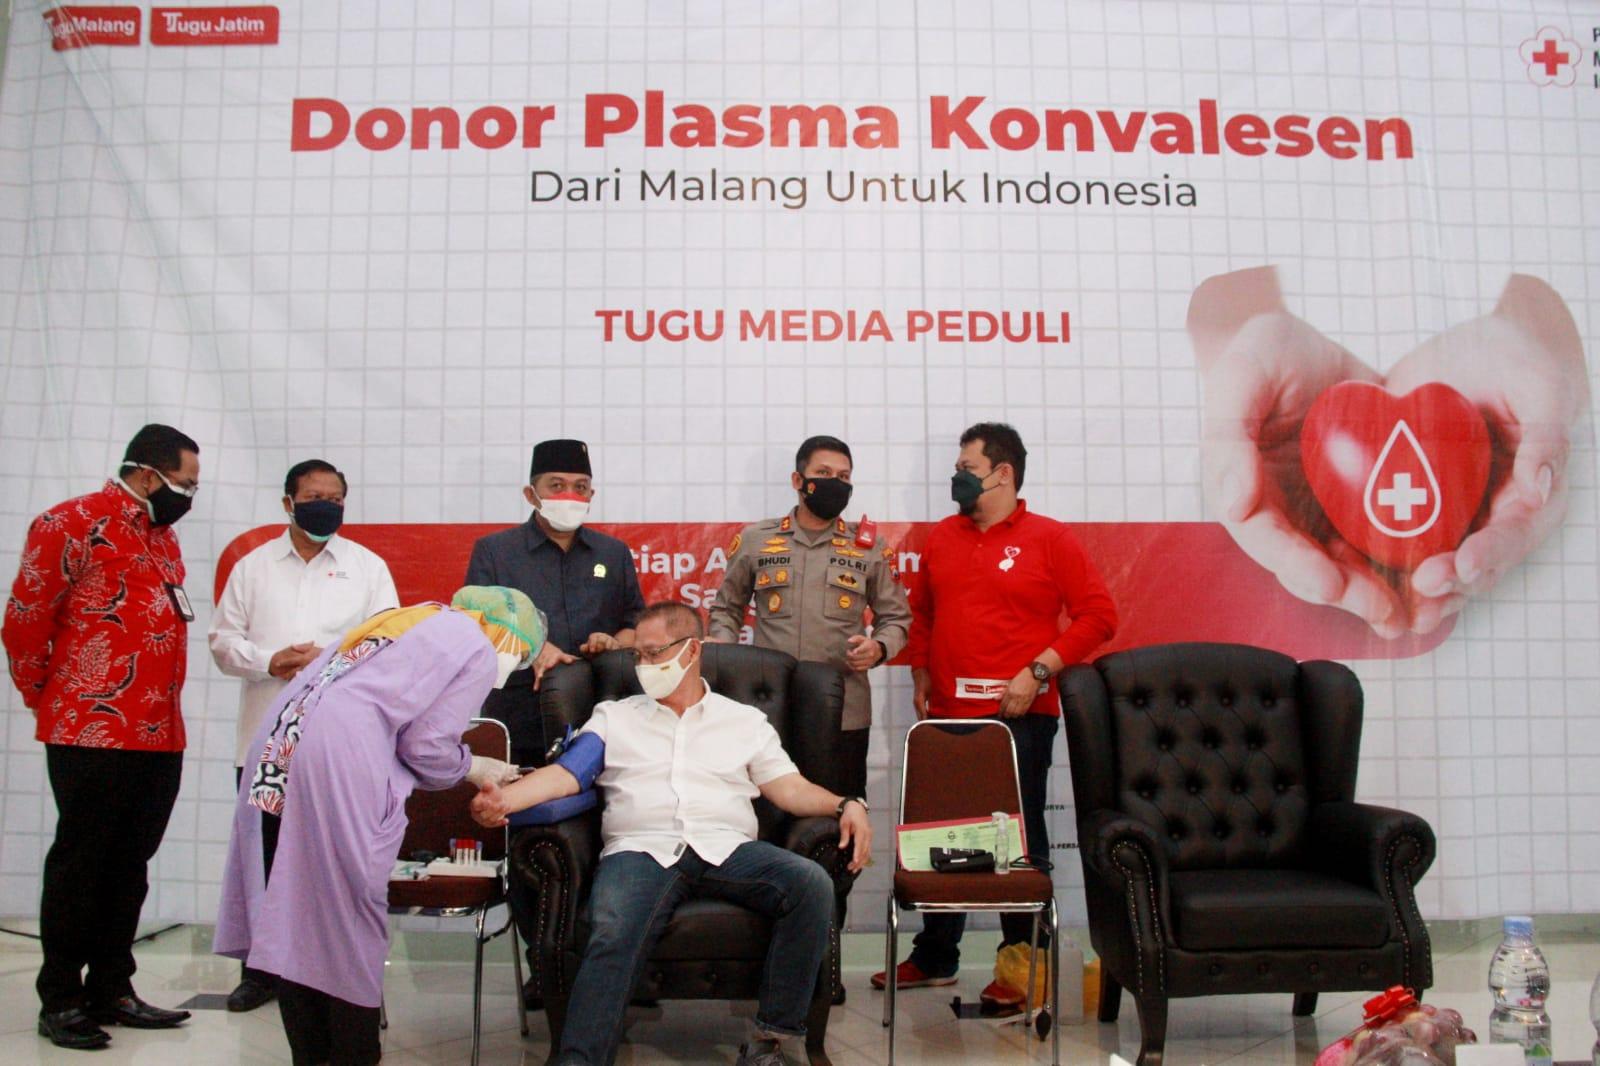 Pengusaha yang juga CEO PT Beton Indotama Surya Sim Putra Bradley selaku penyintas Covid-19 saat donor plasma konvalesen yang digagas Tugu Media Group di Aula Kantor DPRD Kota Malang pada Kamis (12/08/2021). (Foto: Rubianto/Tugu Jatim)